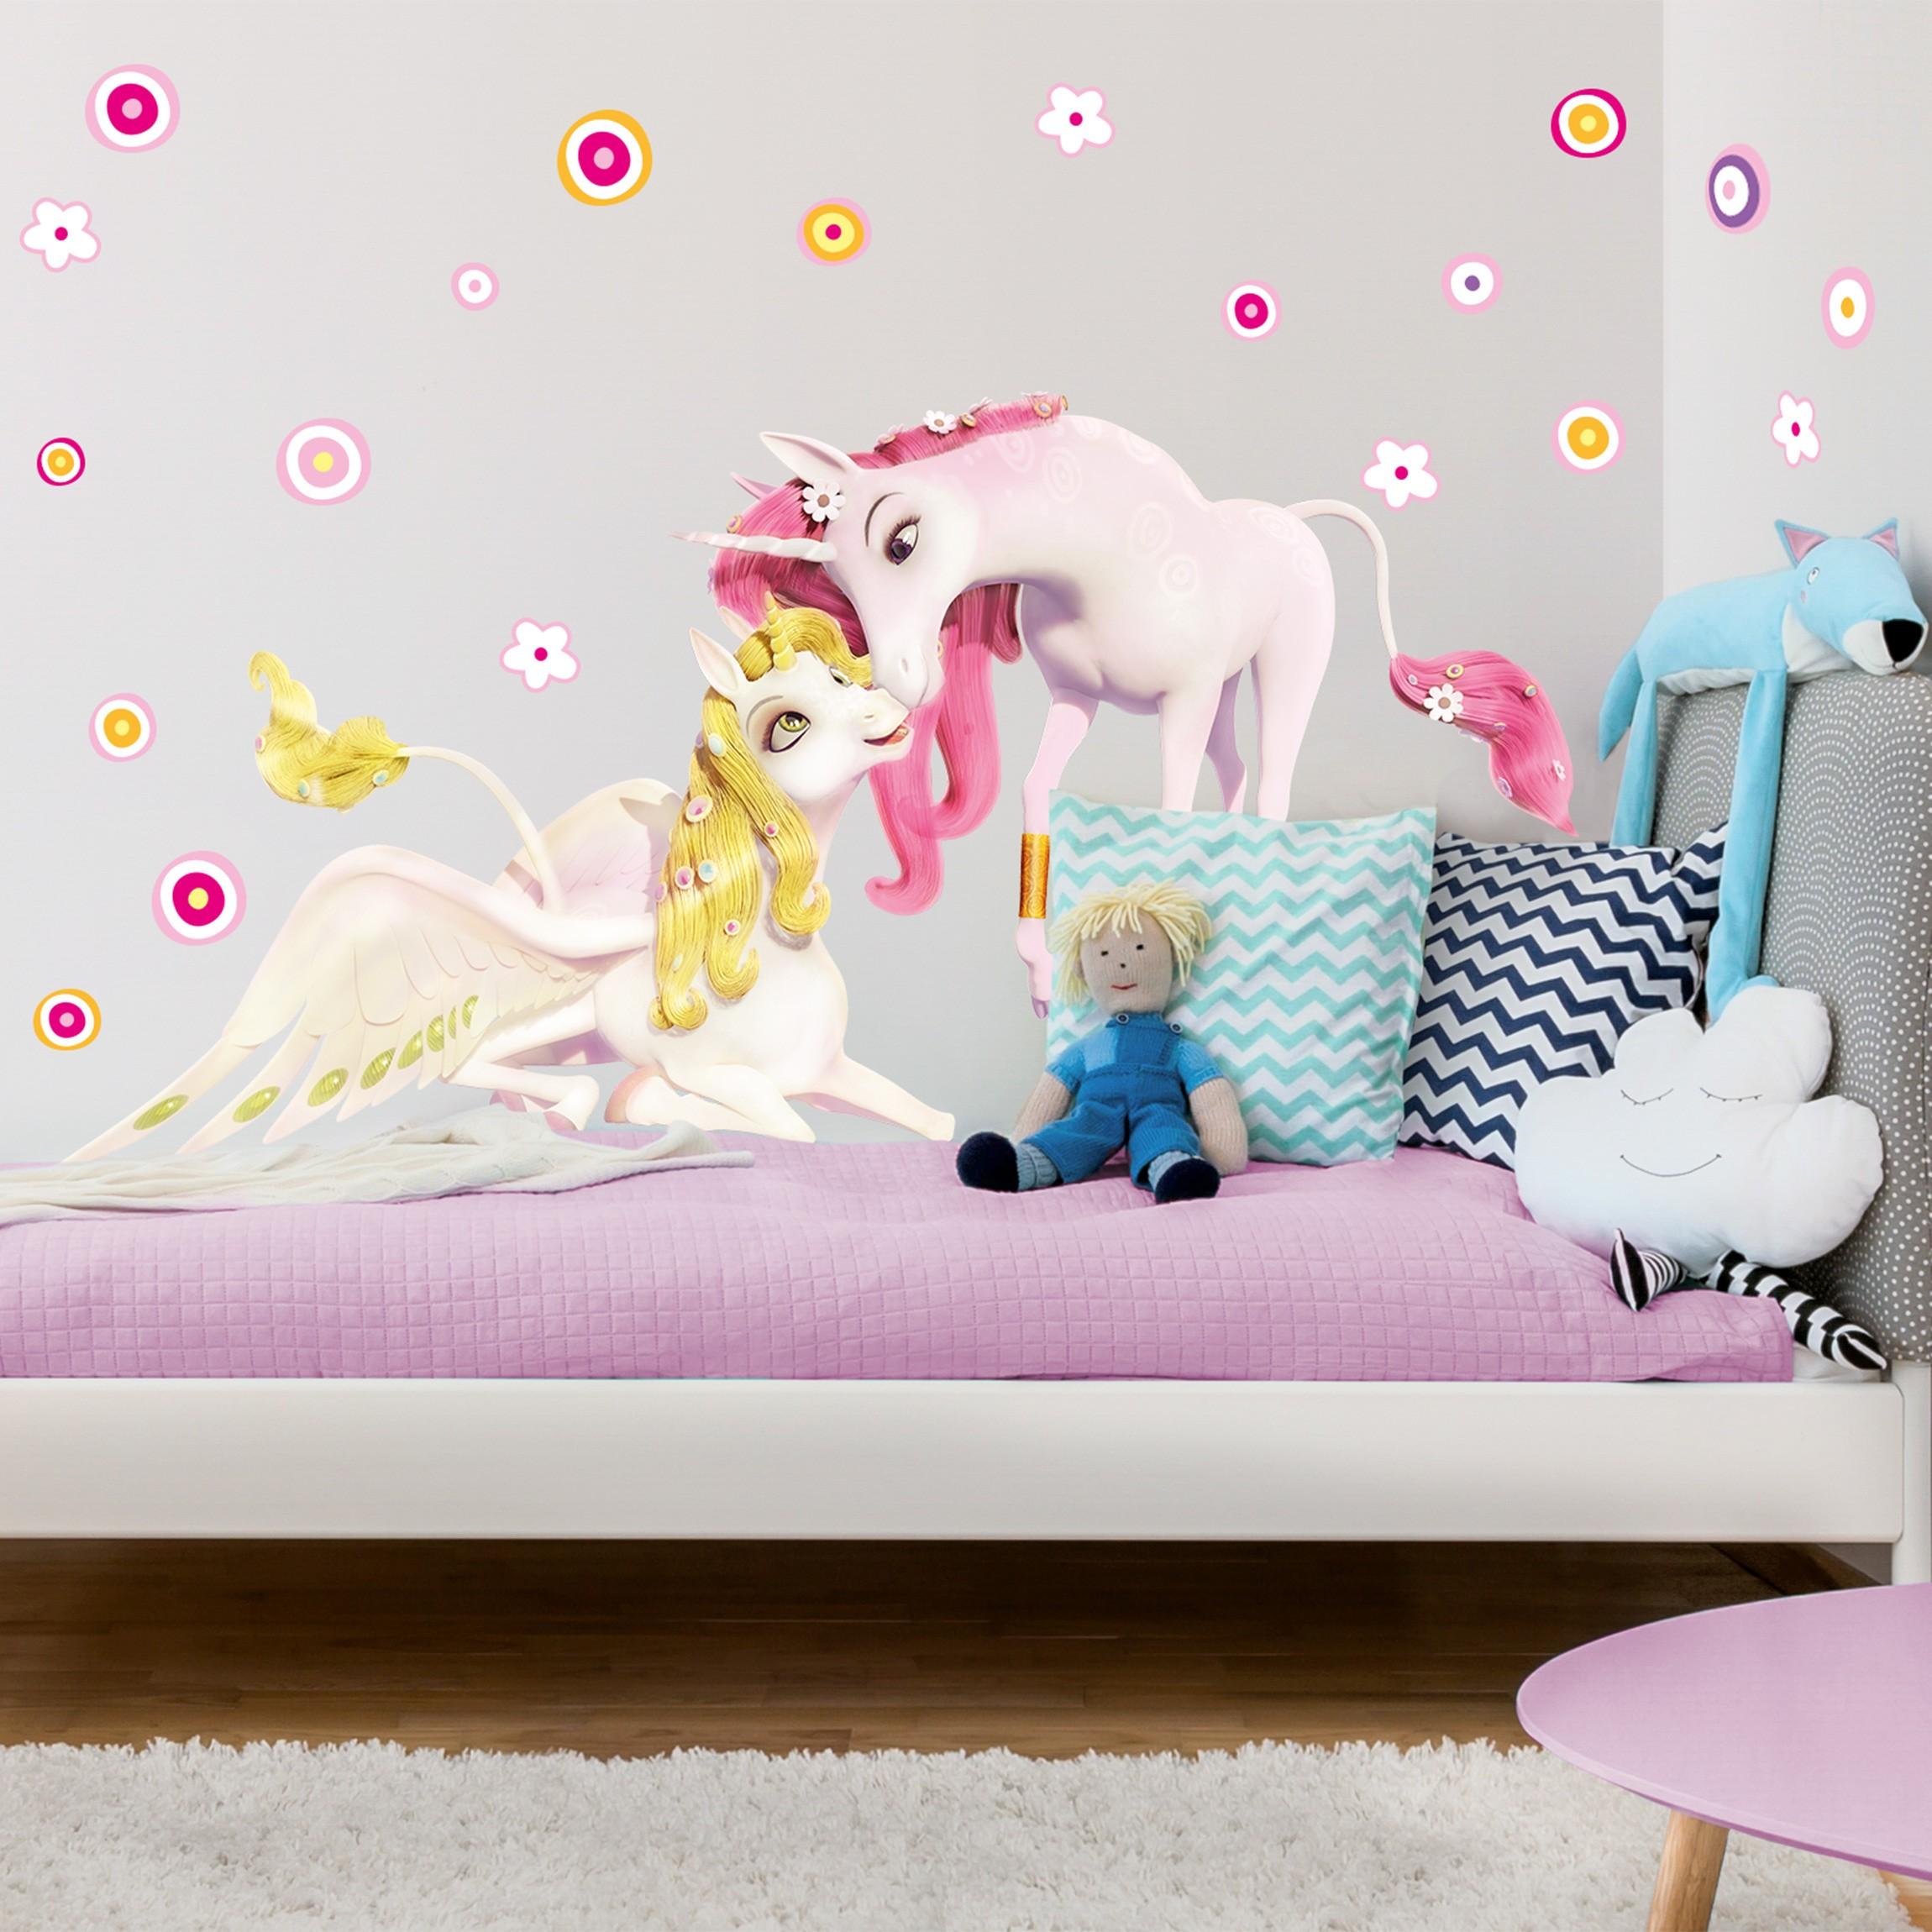 wandtattoo kinderzimmer mia and me einh rner onchao und lyria. Black Bedroom Furniture Sets. Home Design Ideas